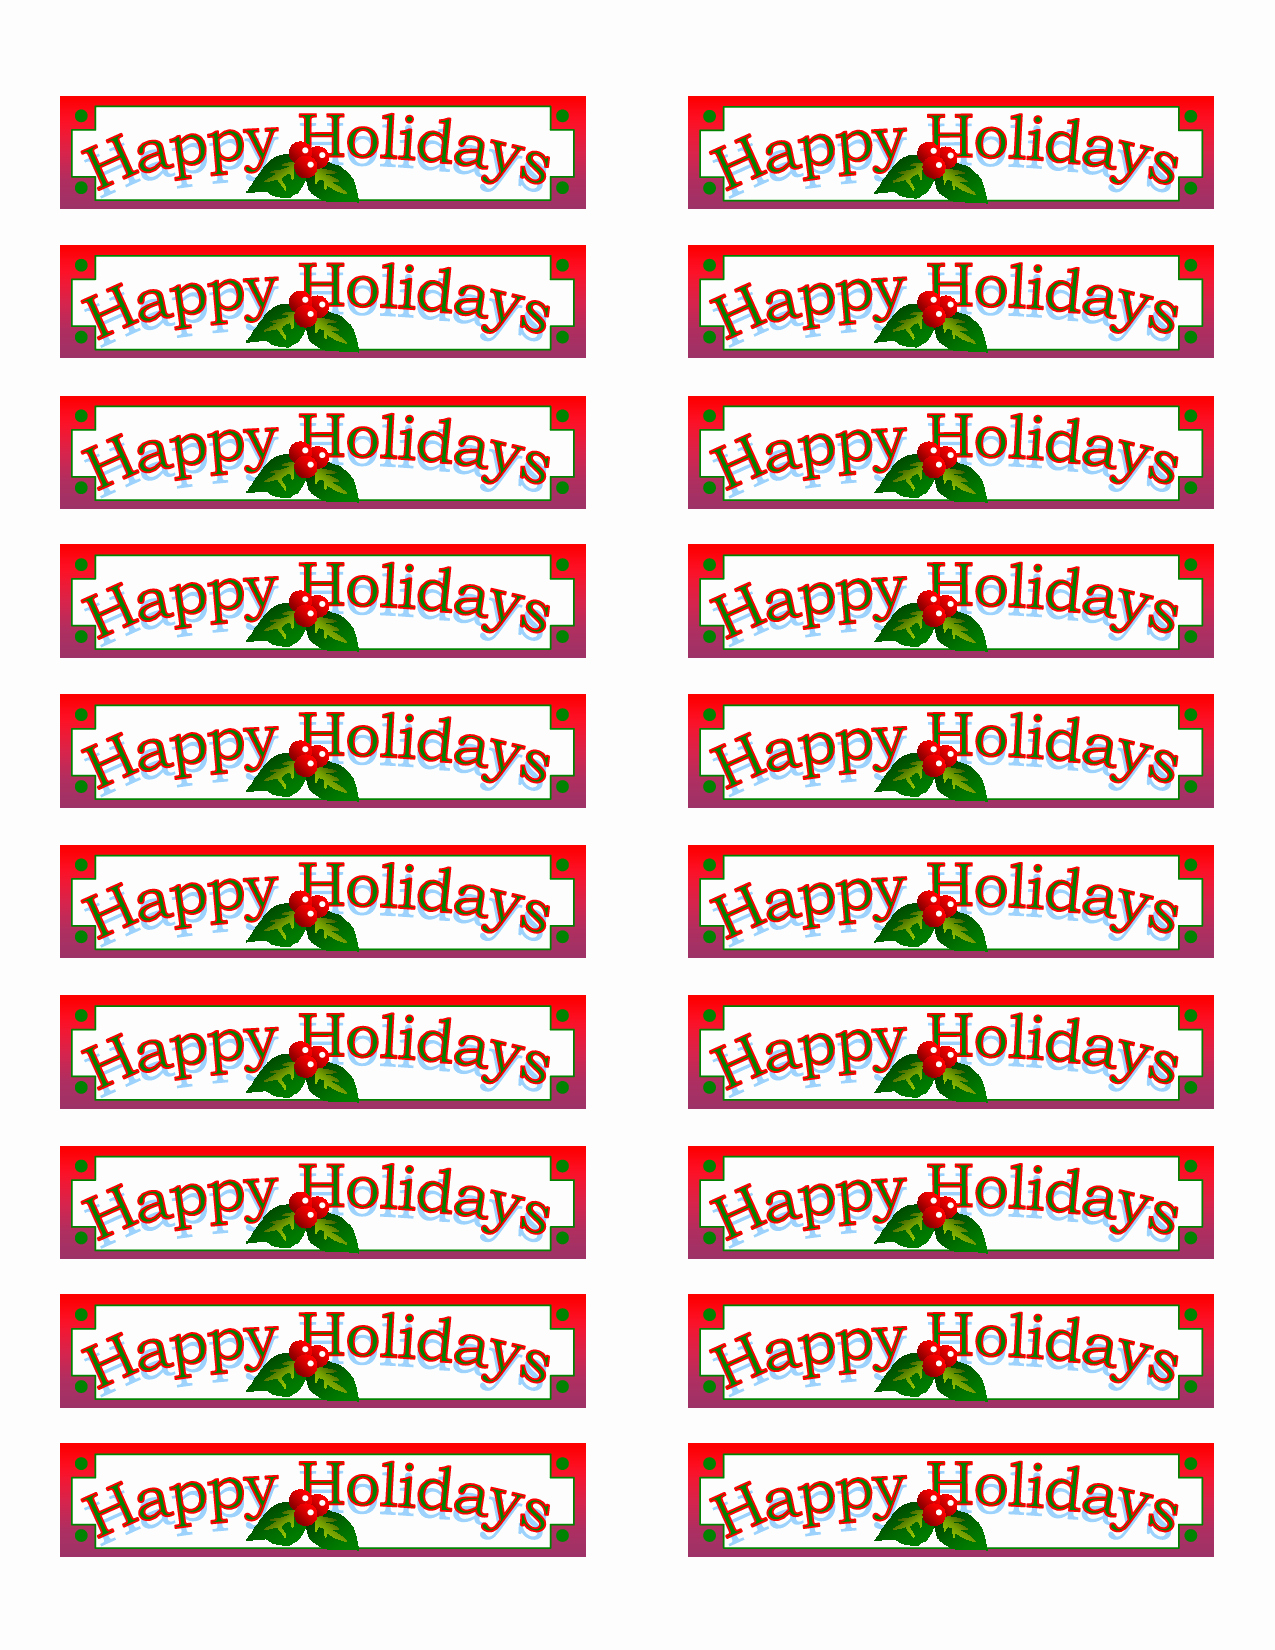 Holiday Return Address Label Templates New Christmas Return Address Labels Template Avery 5160 top